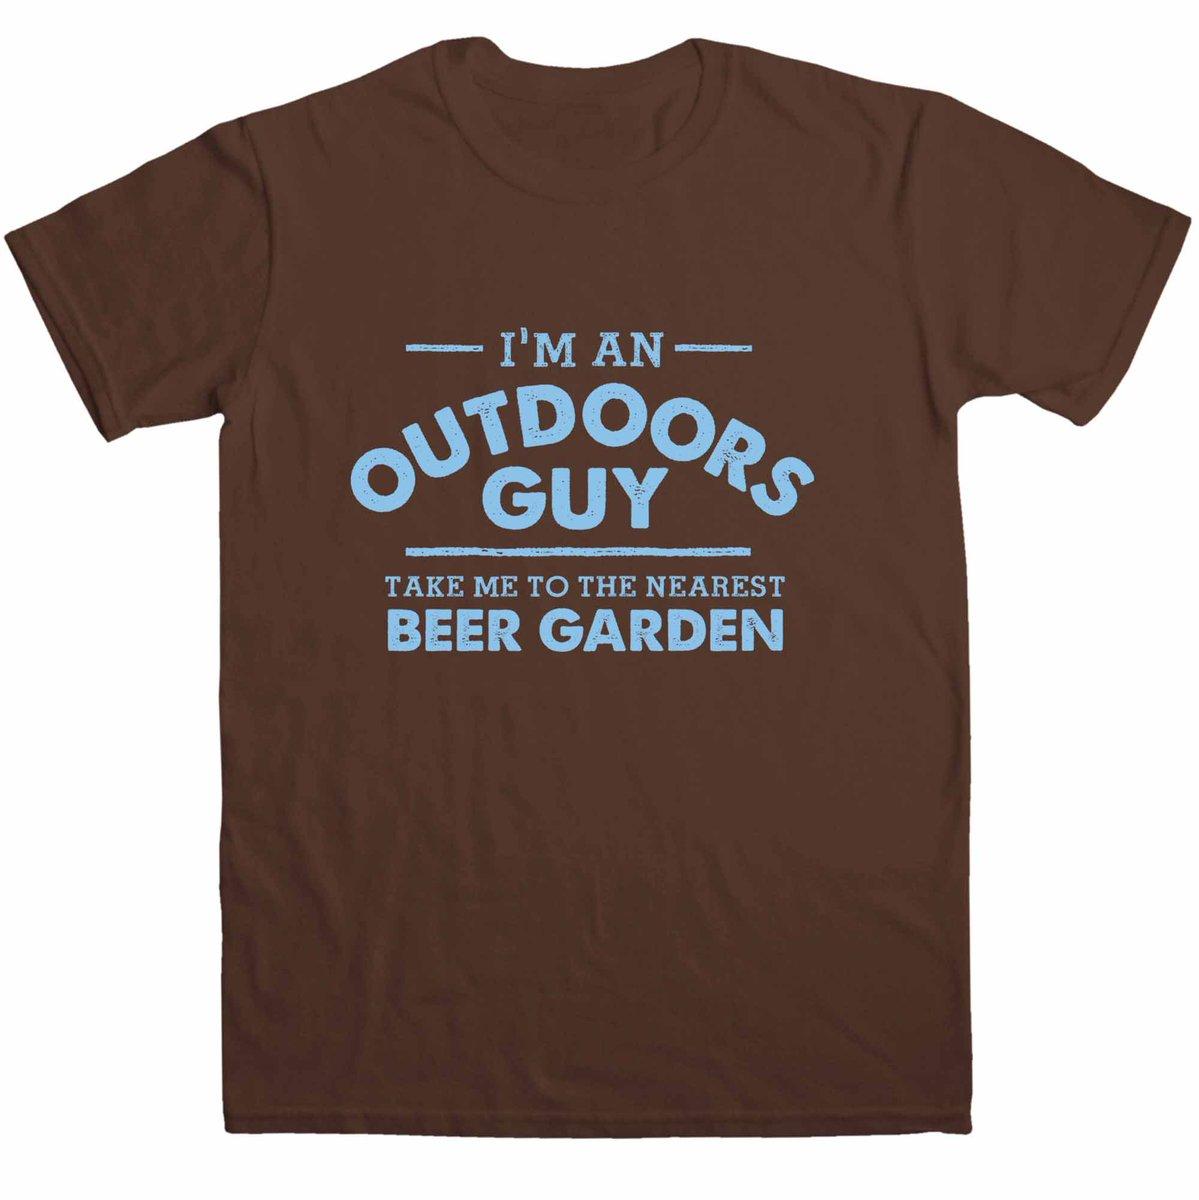 I'm an outdoors guy - take me to the nea...